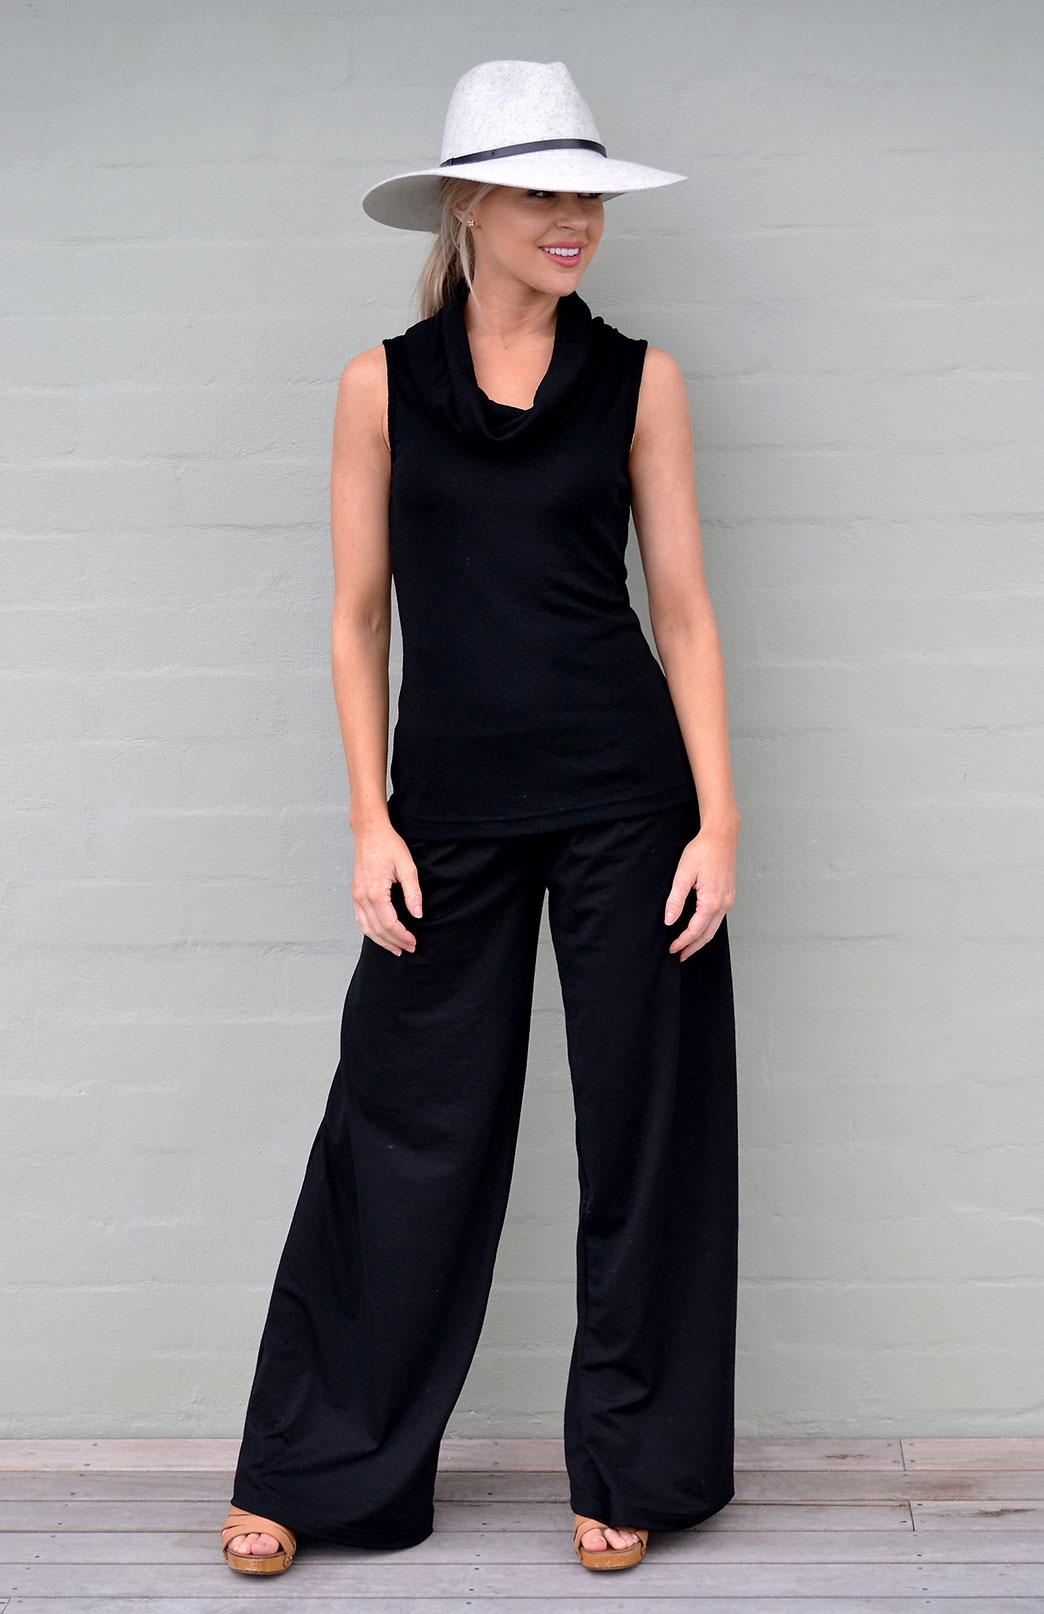 Cowl Neck Top - Sleeveless - Women's Black Sleeveless Trans-Seasonal Wool Top - Smitten Merino Tasmania Australia